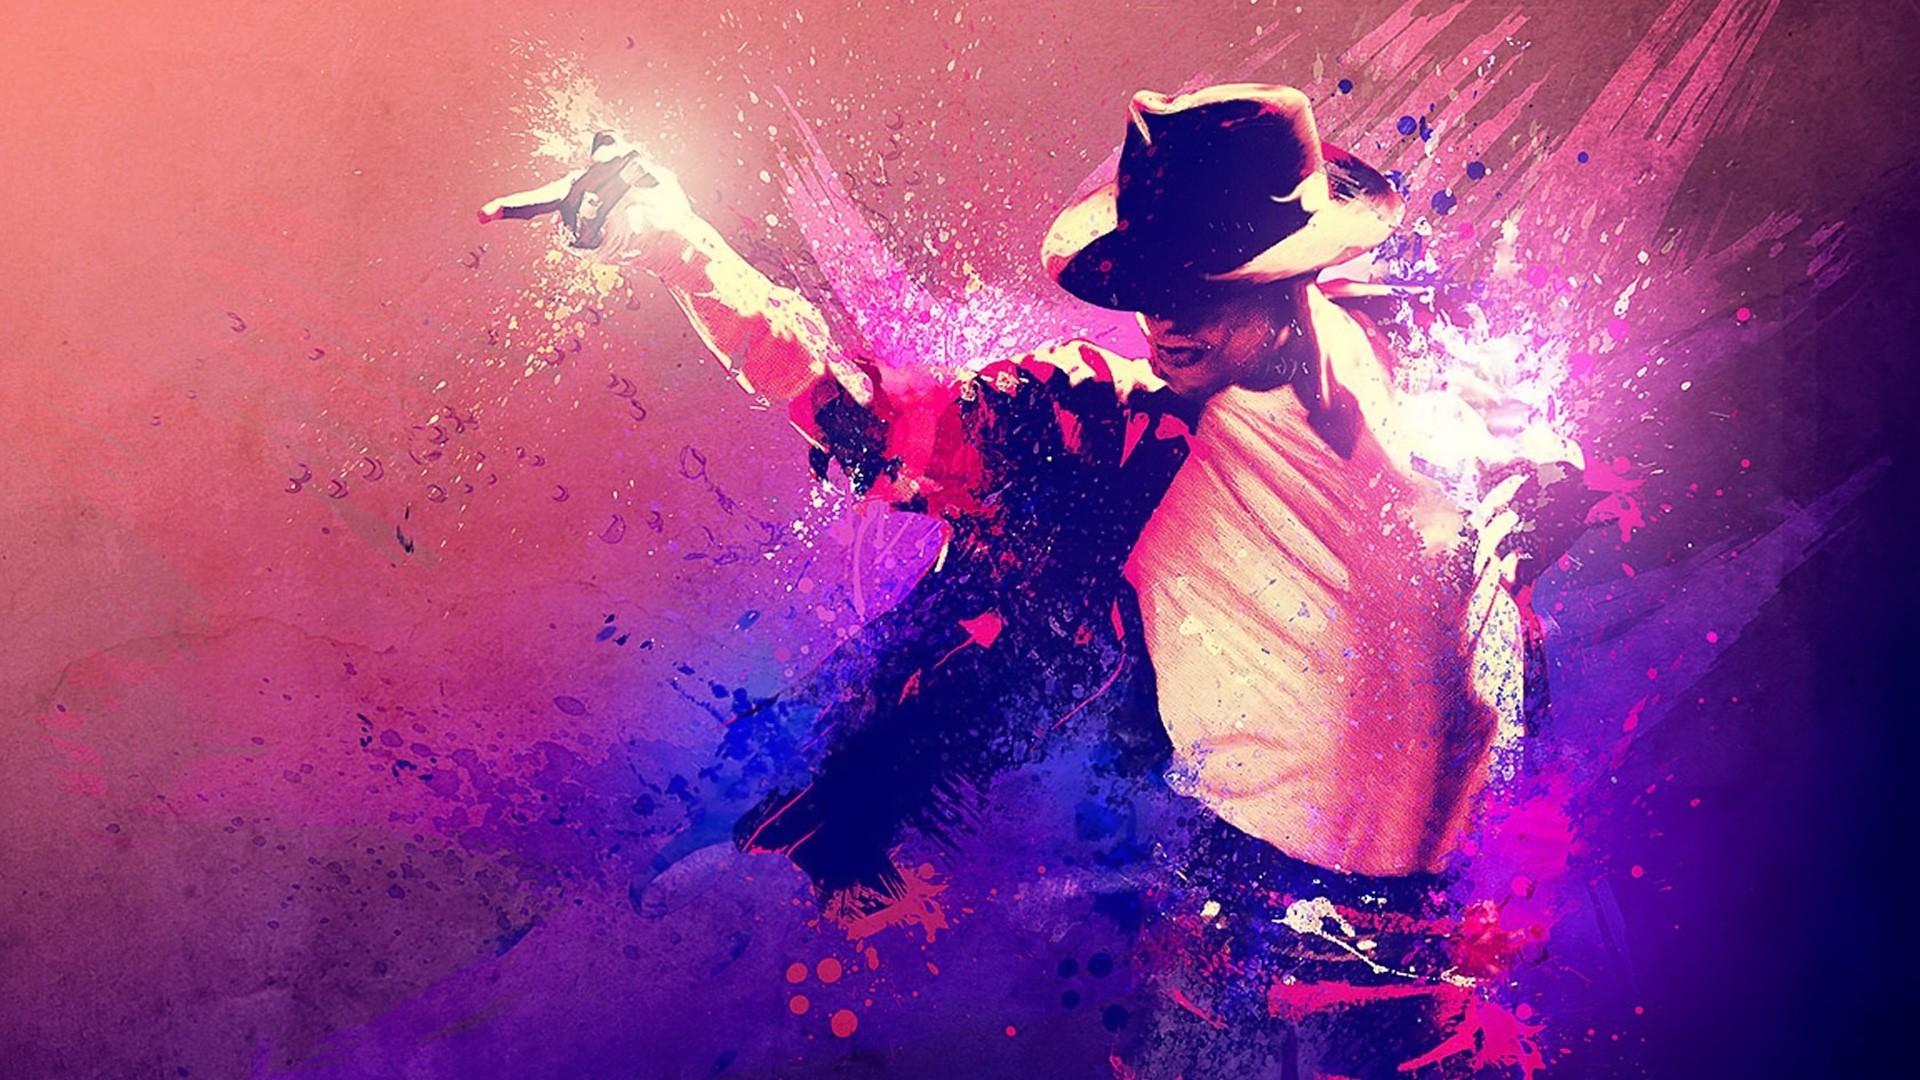 Michael Jackson - 1920x1080